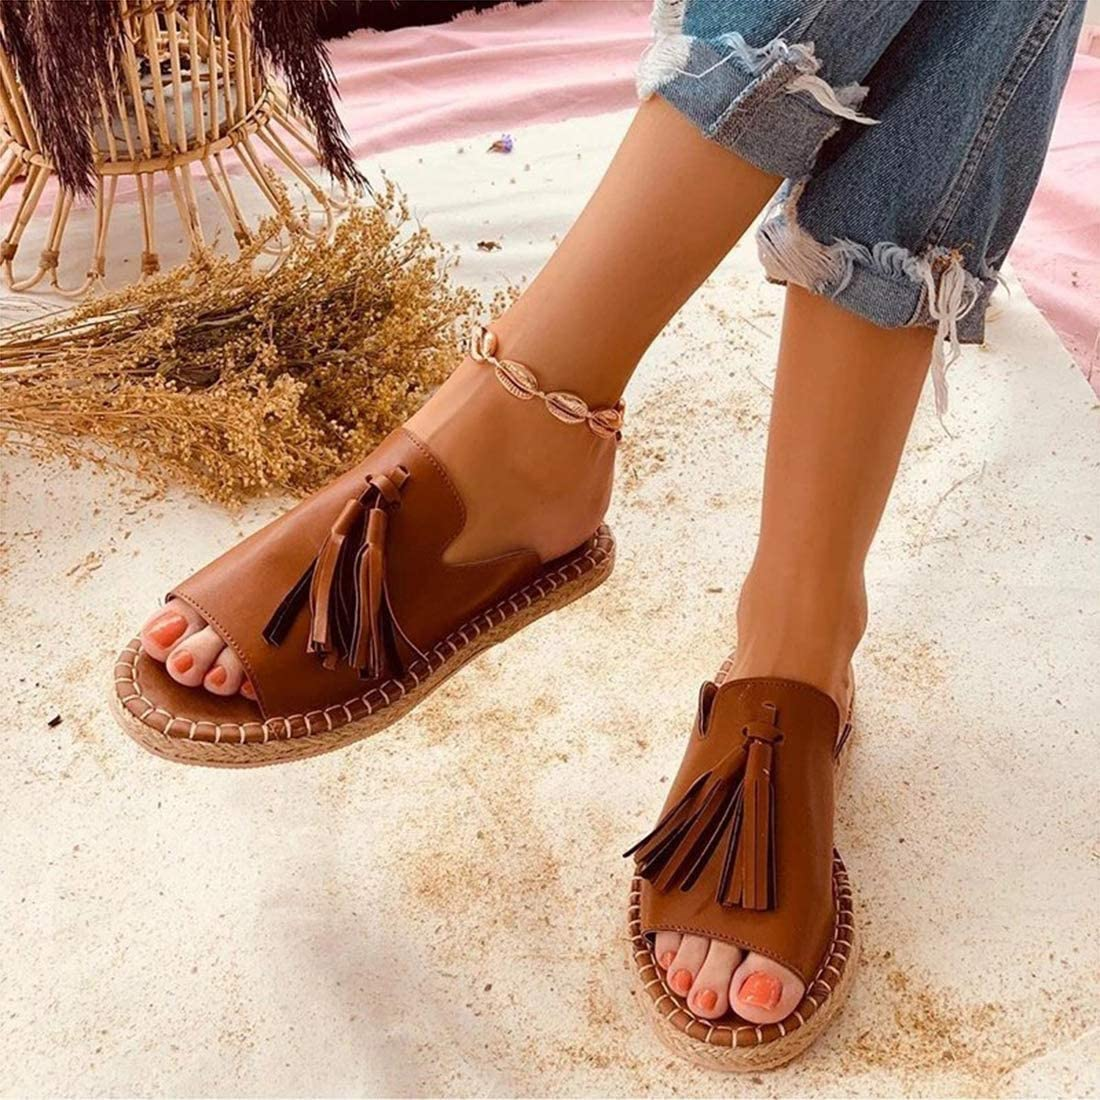 Sandals for Women Platform Tassel Leather Sandal Canvas Espadrille Suede Strap Buckle Slide Mules Heeled Ladies Beach Non Slip Espadrilles,Brown,41